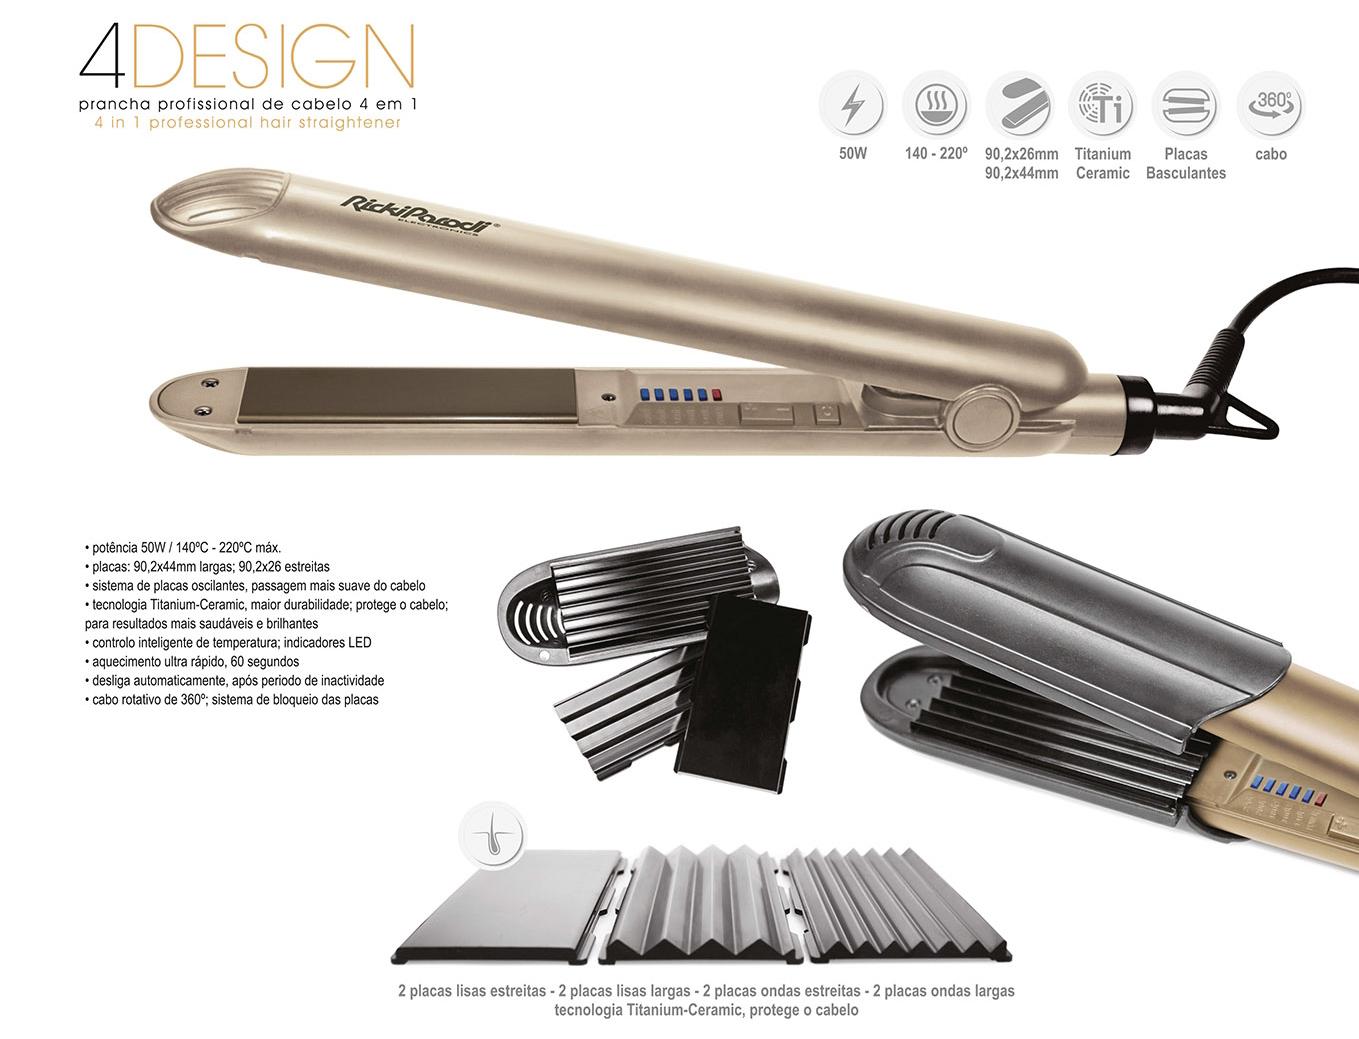 Ricki Parodi - Prancha Profissional 4 Design